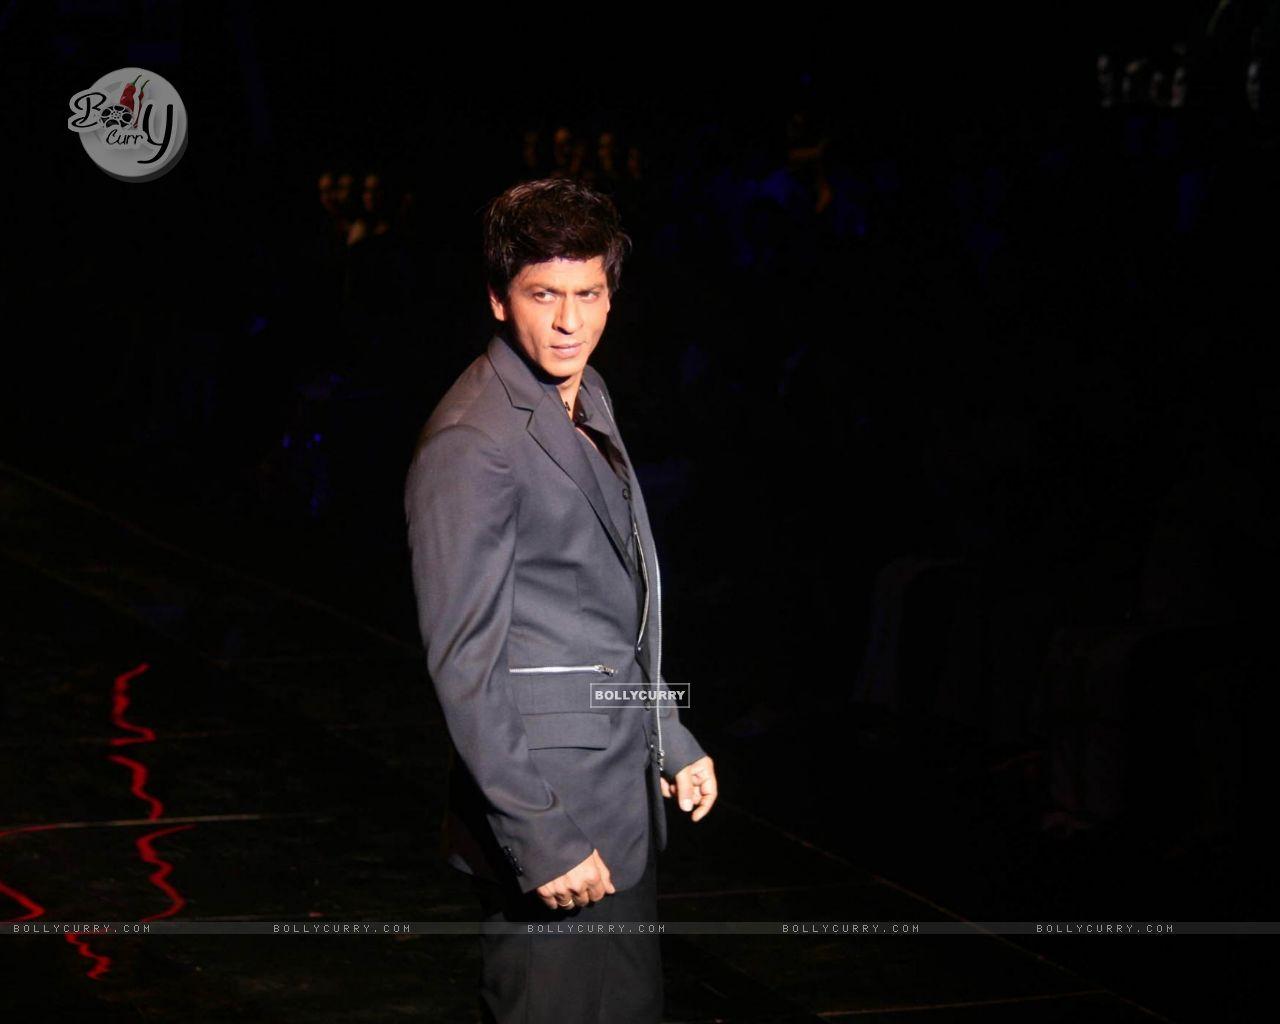 show shahrukh khan pics - photo #6